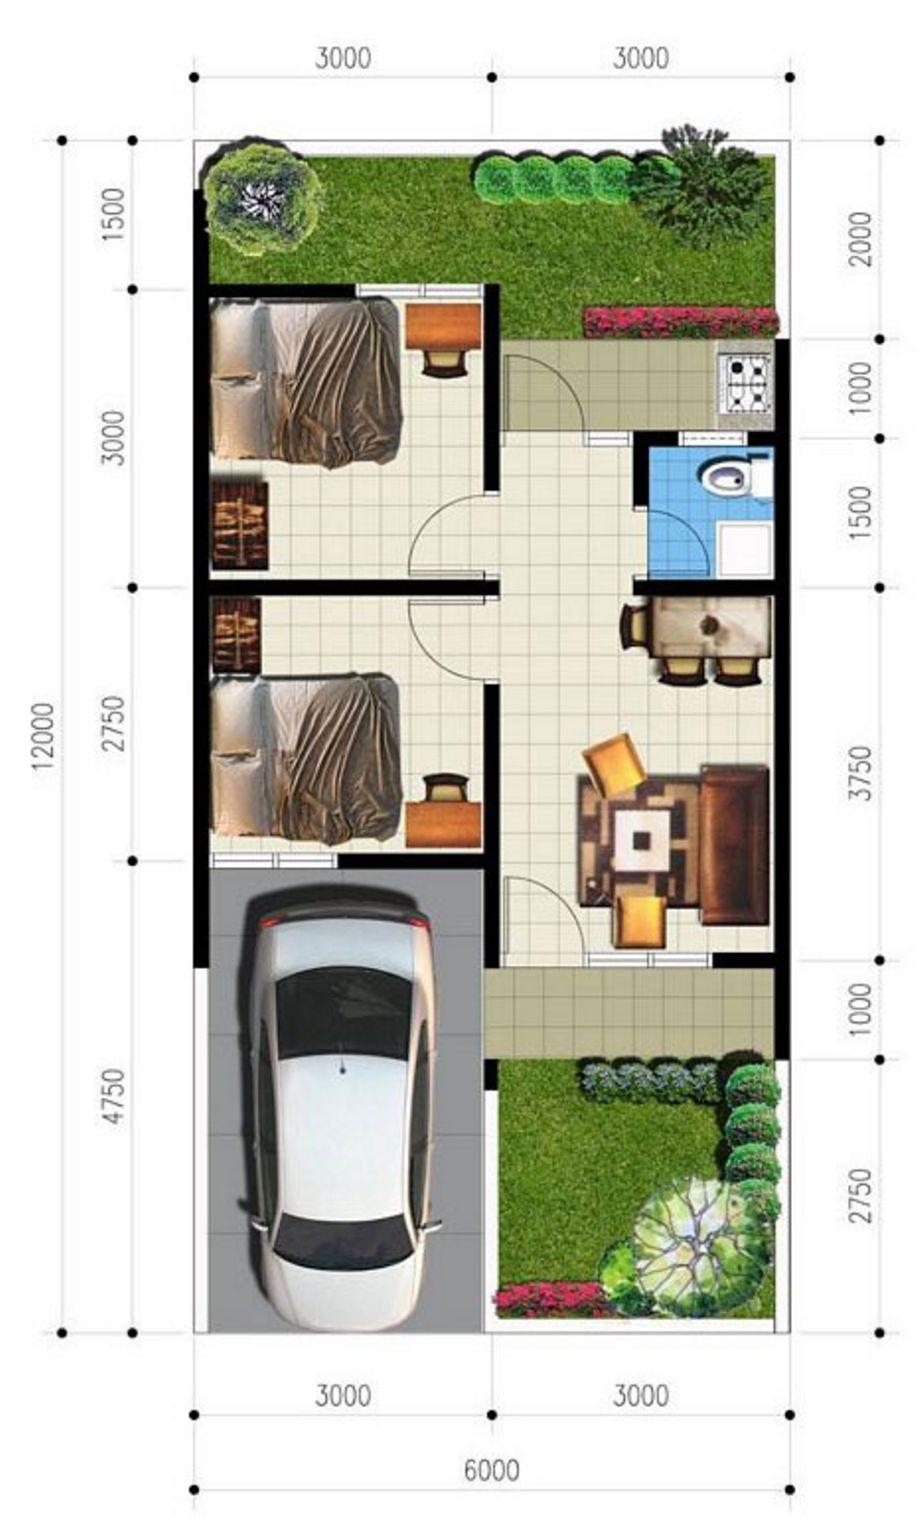 gambar denah ada garasi 6x12 yang bagus